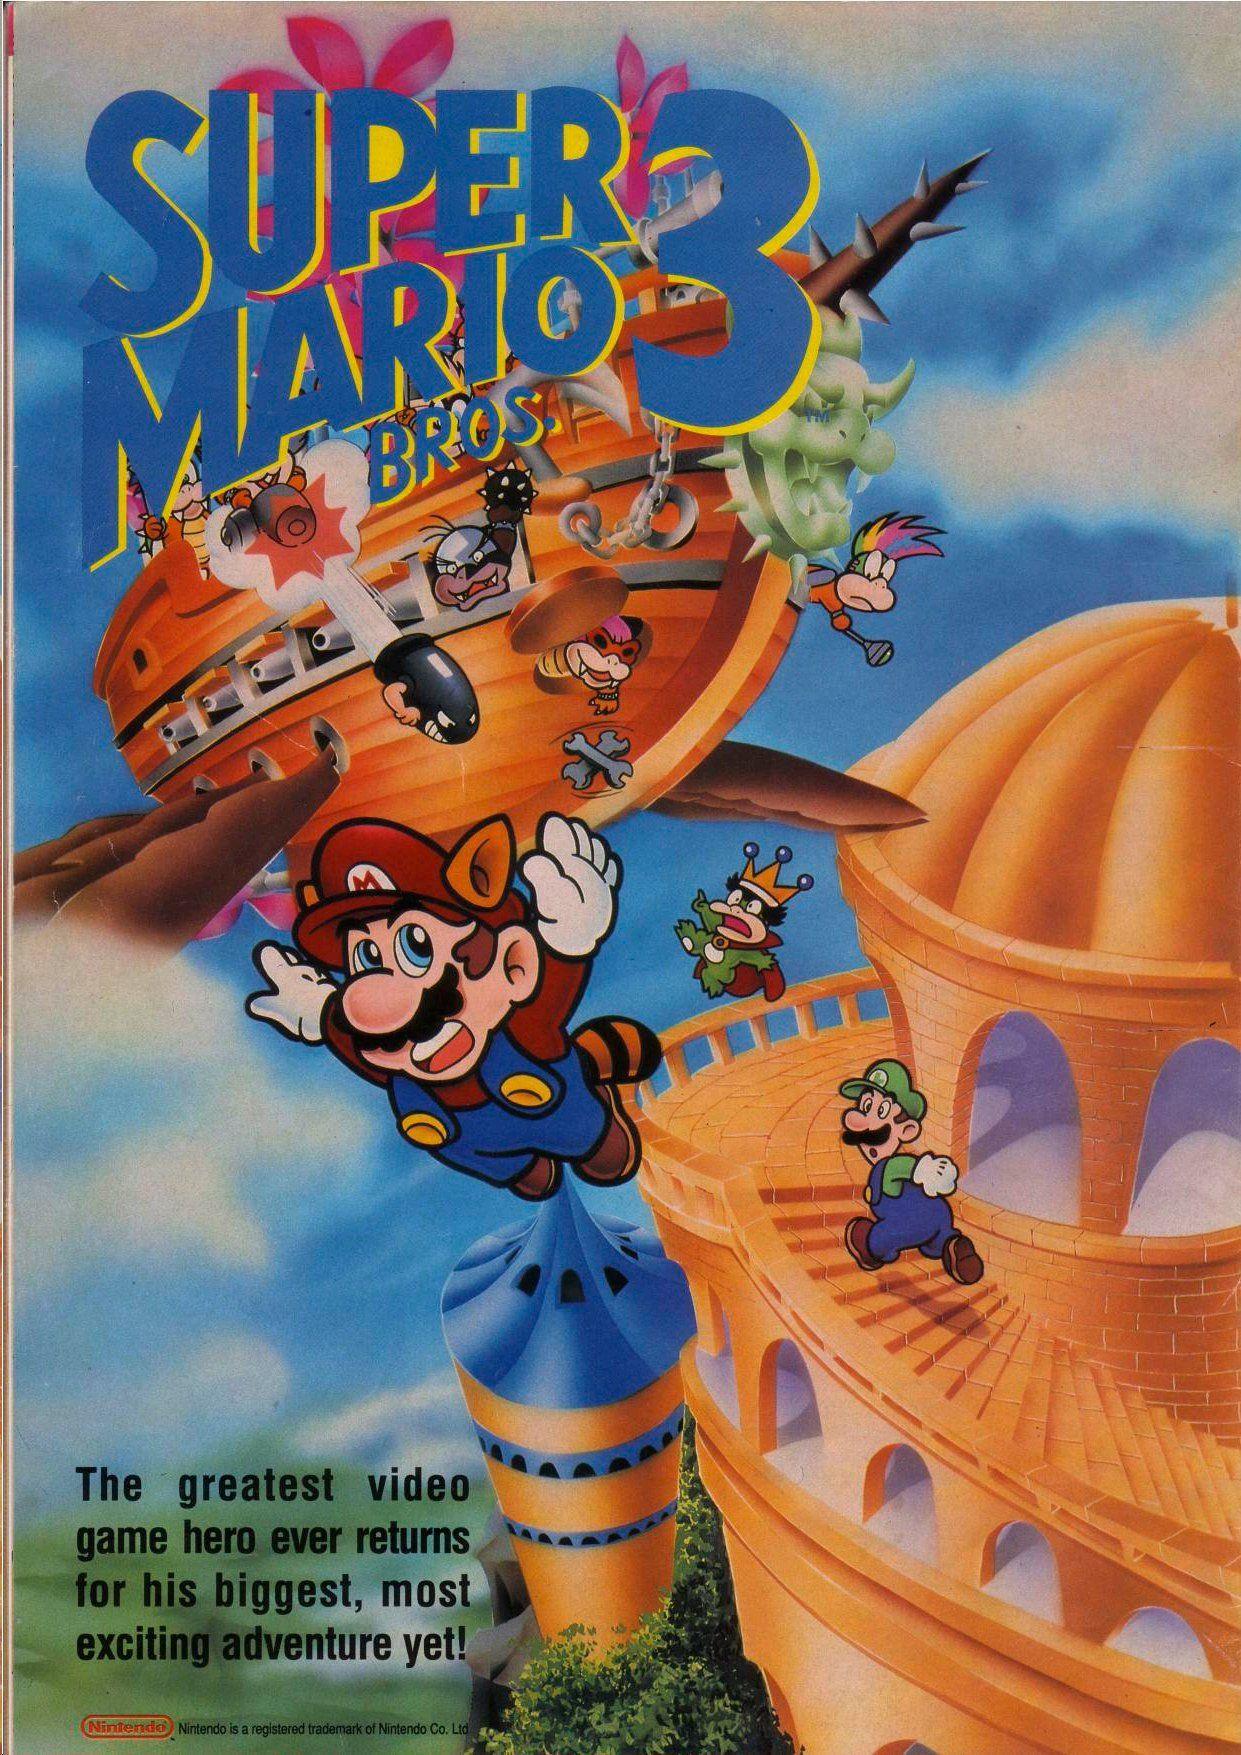 Super mario toys by Jae Mike on Retro Gaming Super mario